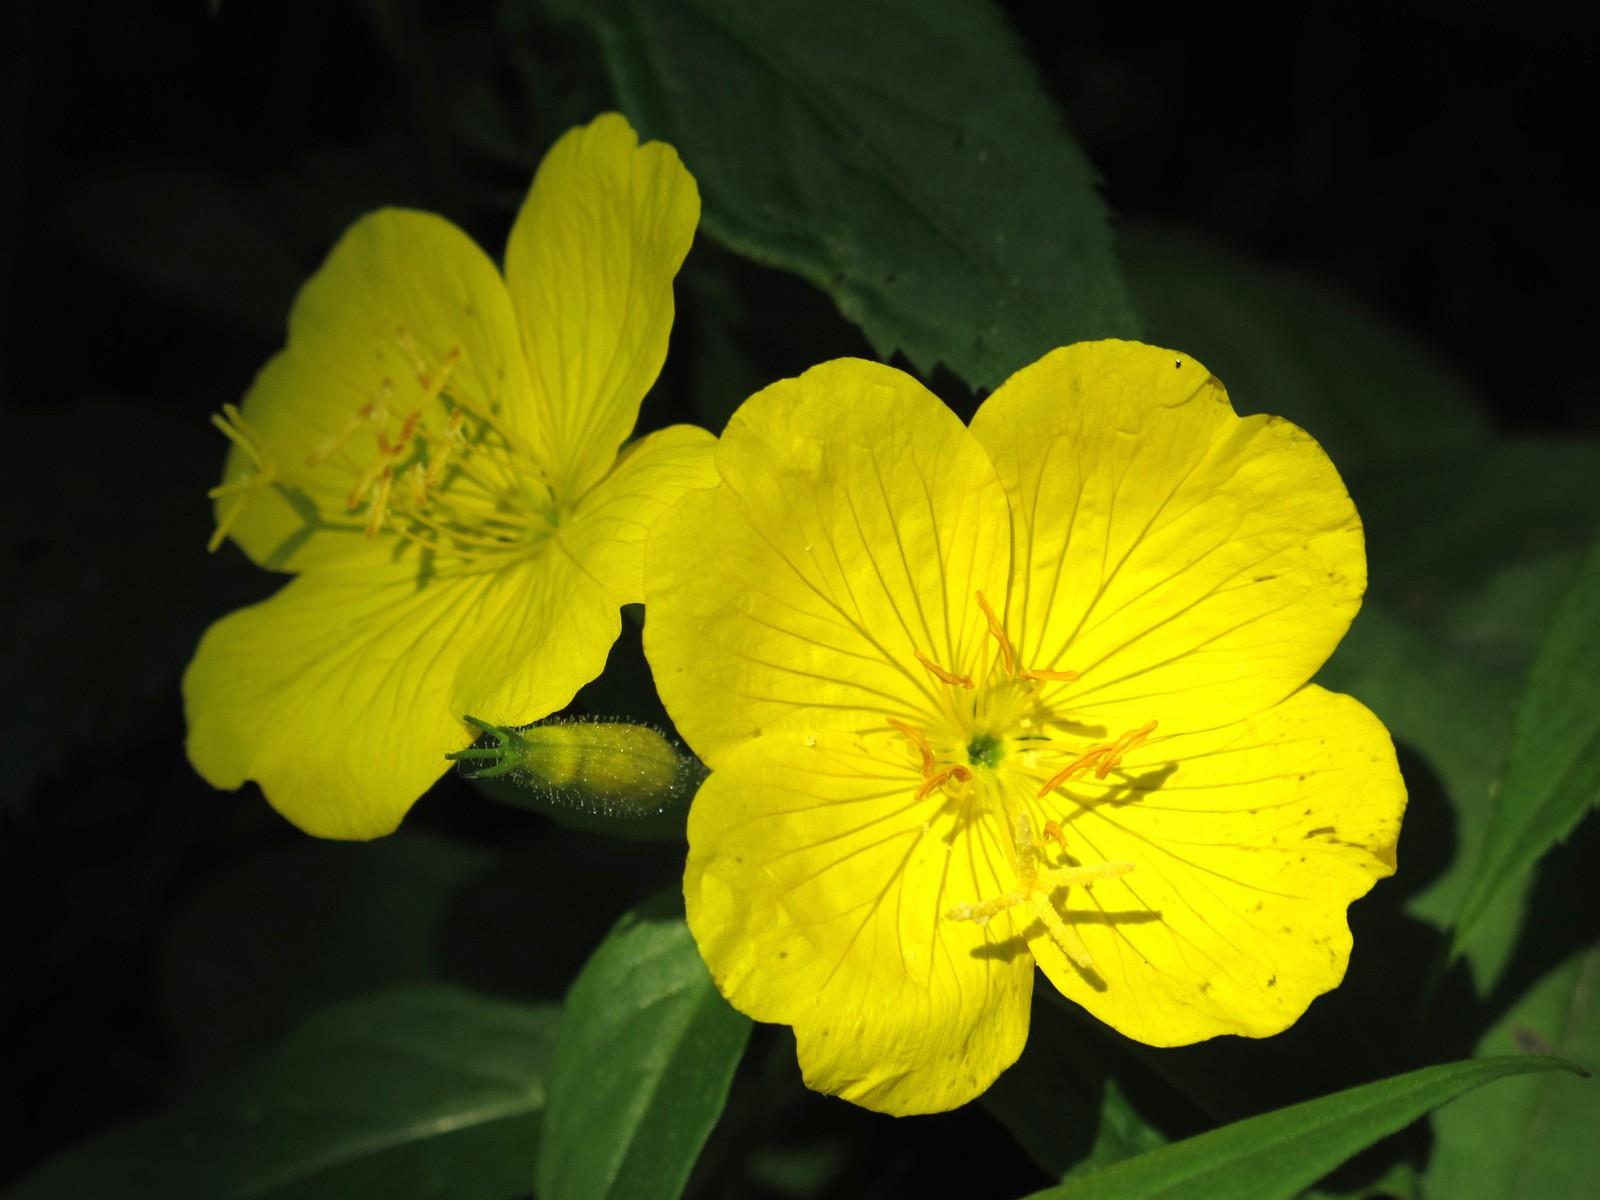 Narrowleaf Evening Primrose Oenothera fruticosa yellow flow